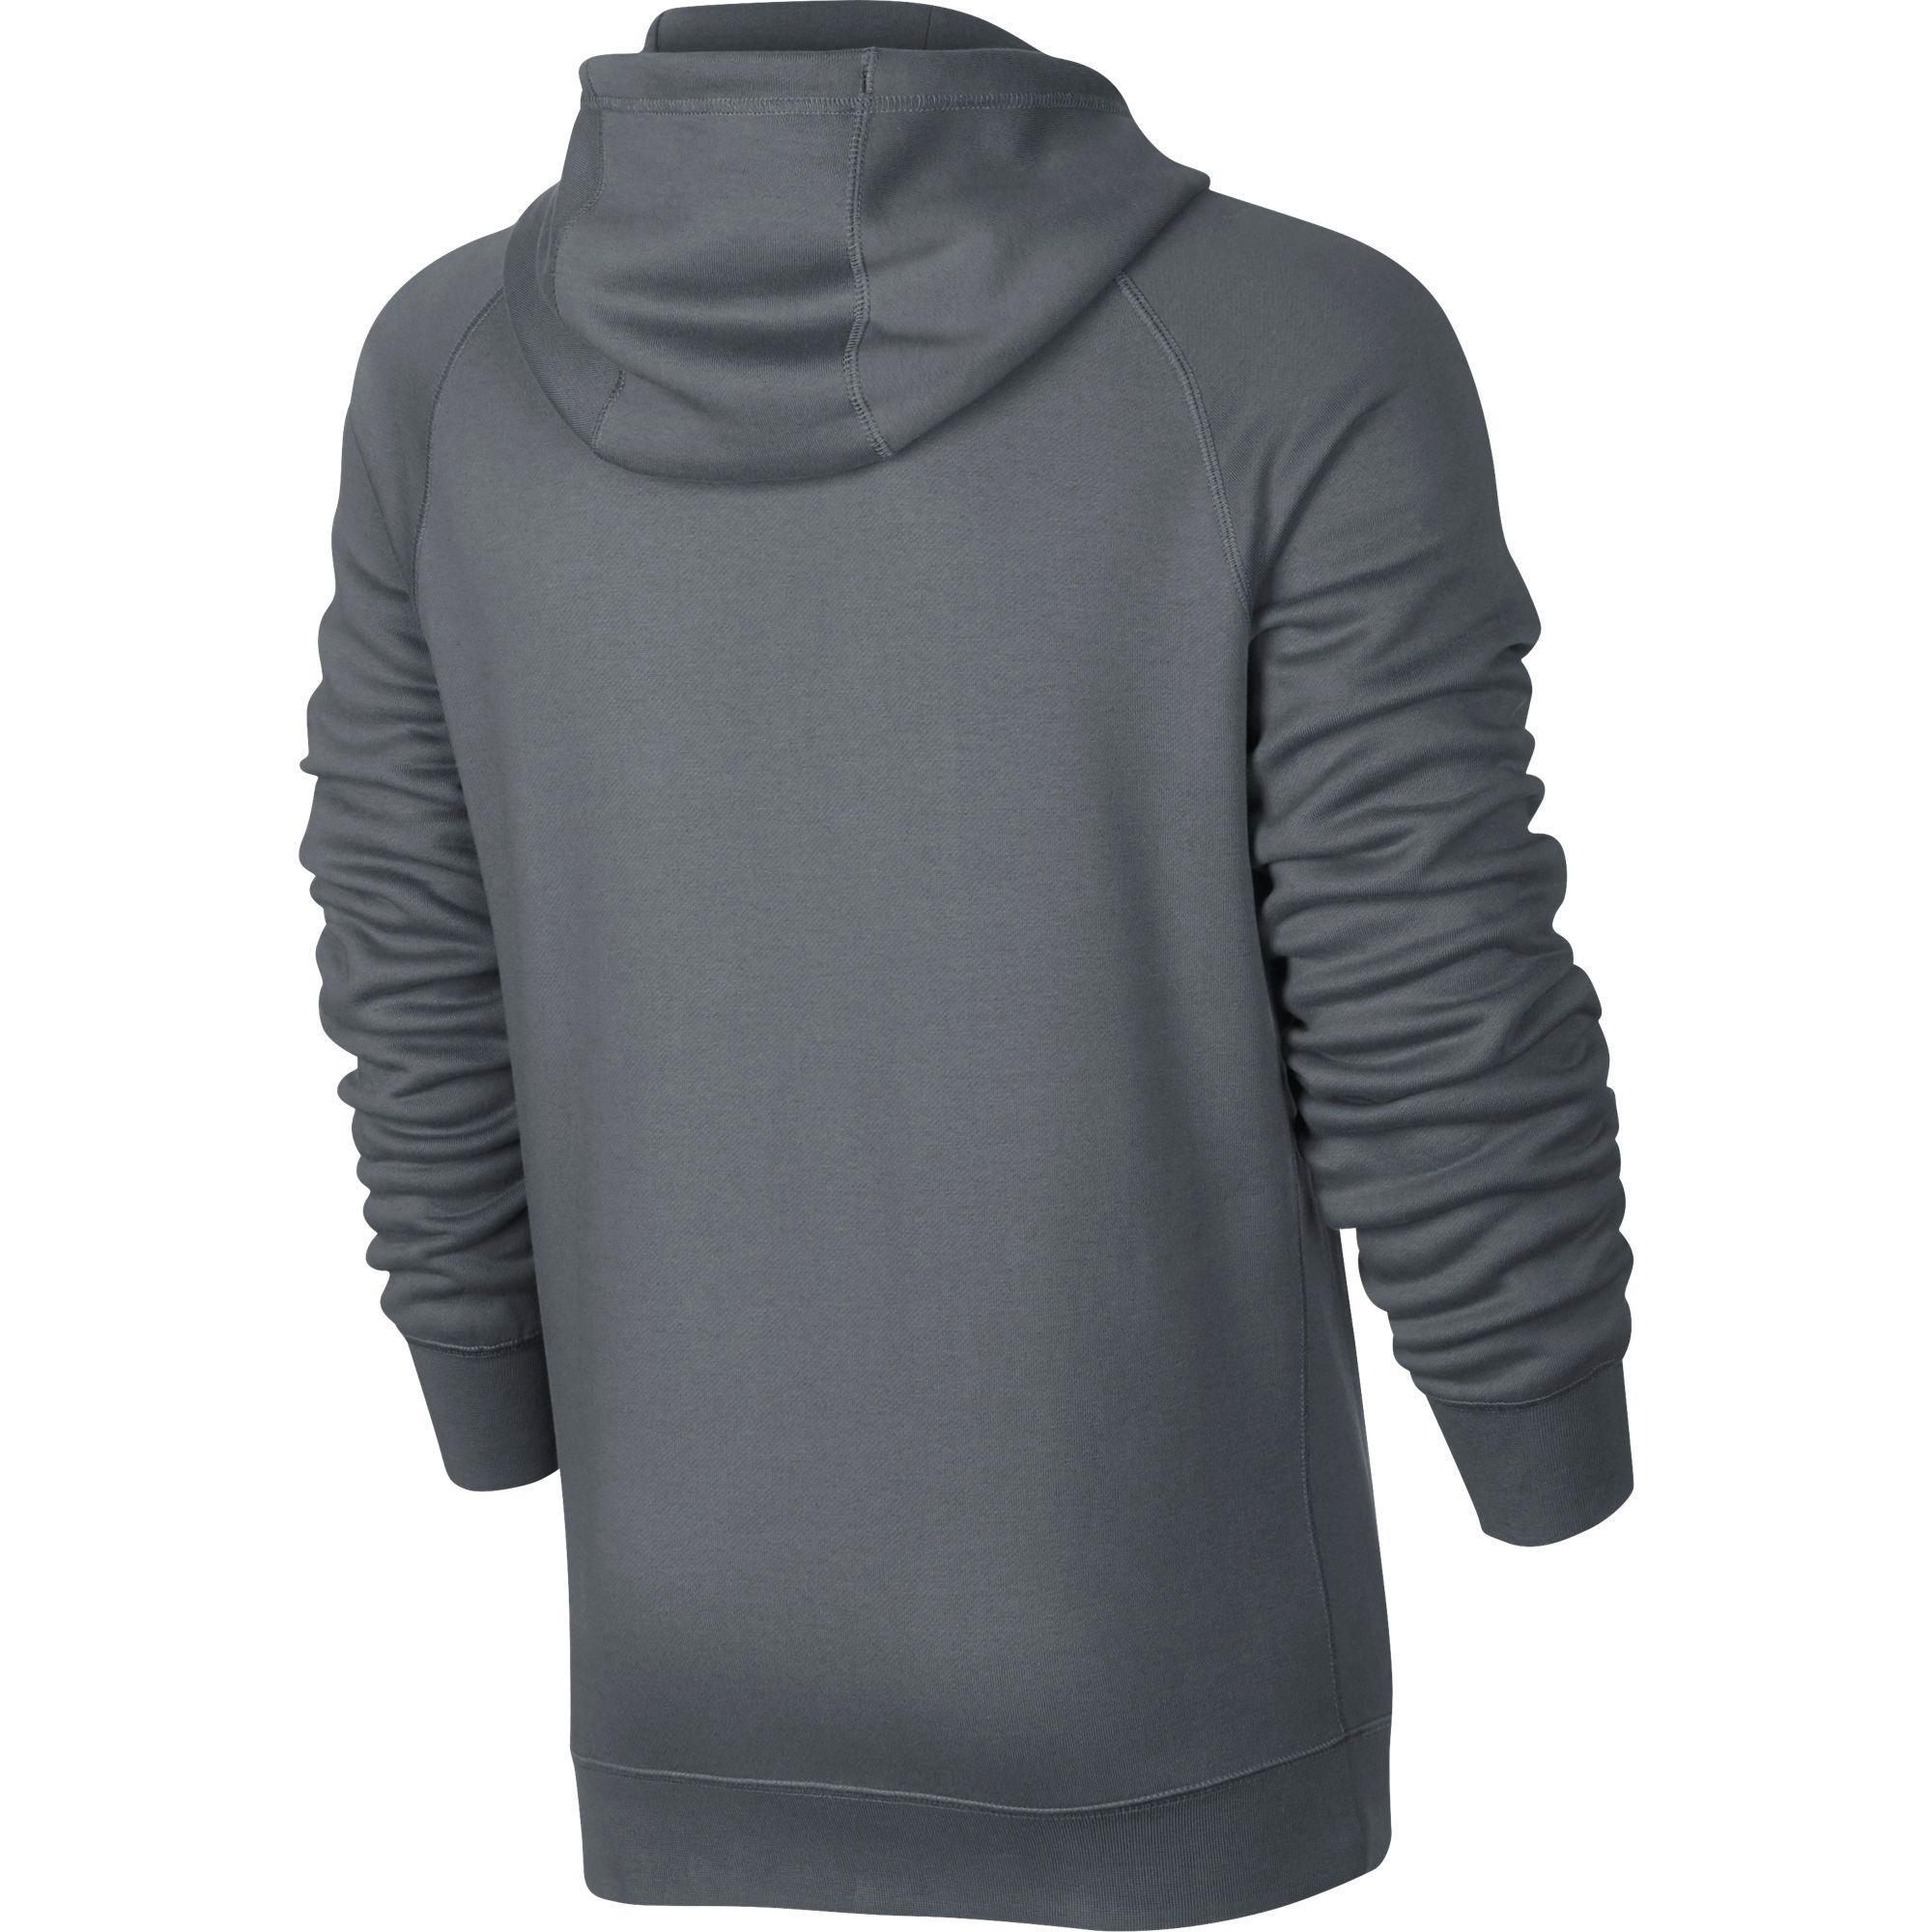 Nike Mens Sportswear Hoodie - Cool Grey - Tennisnuts.com